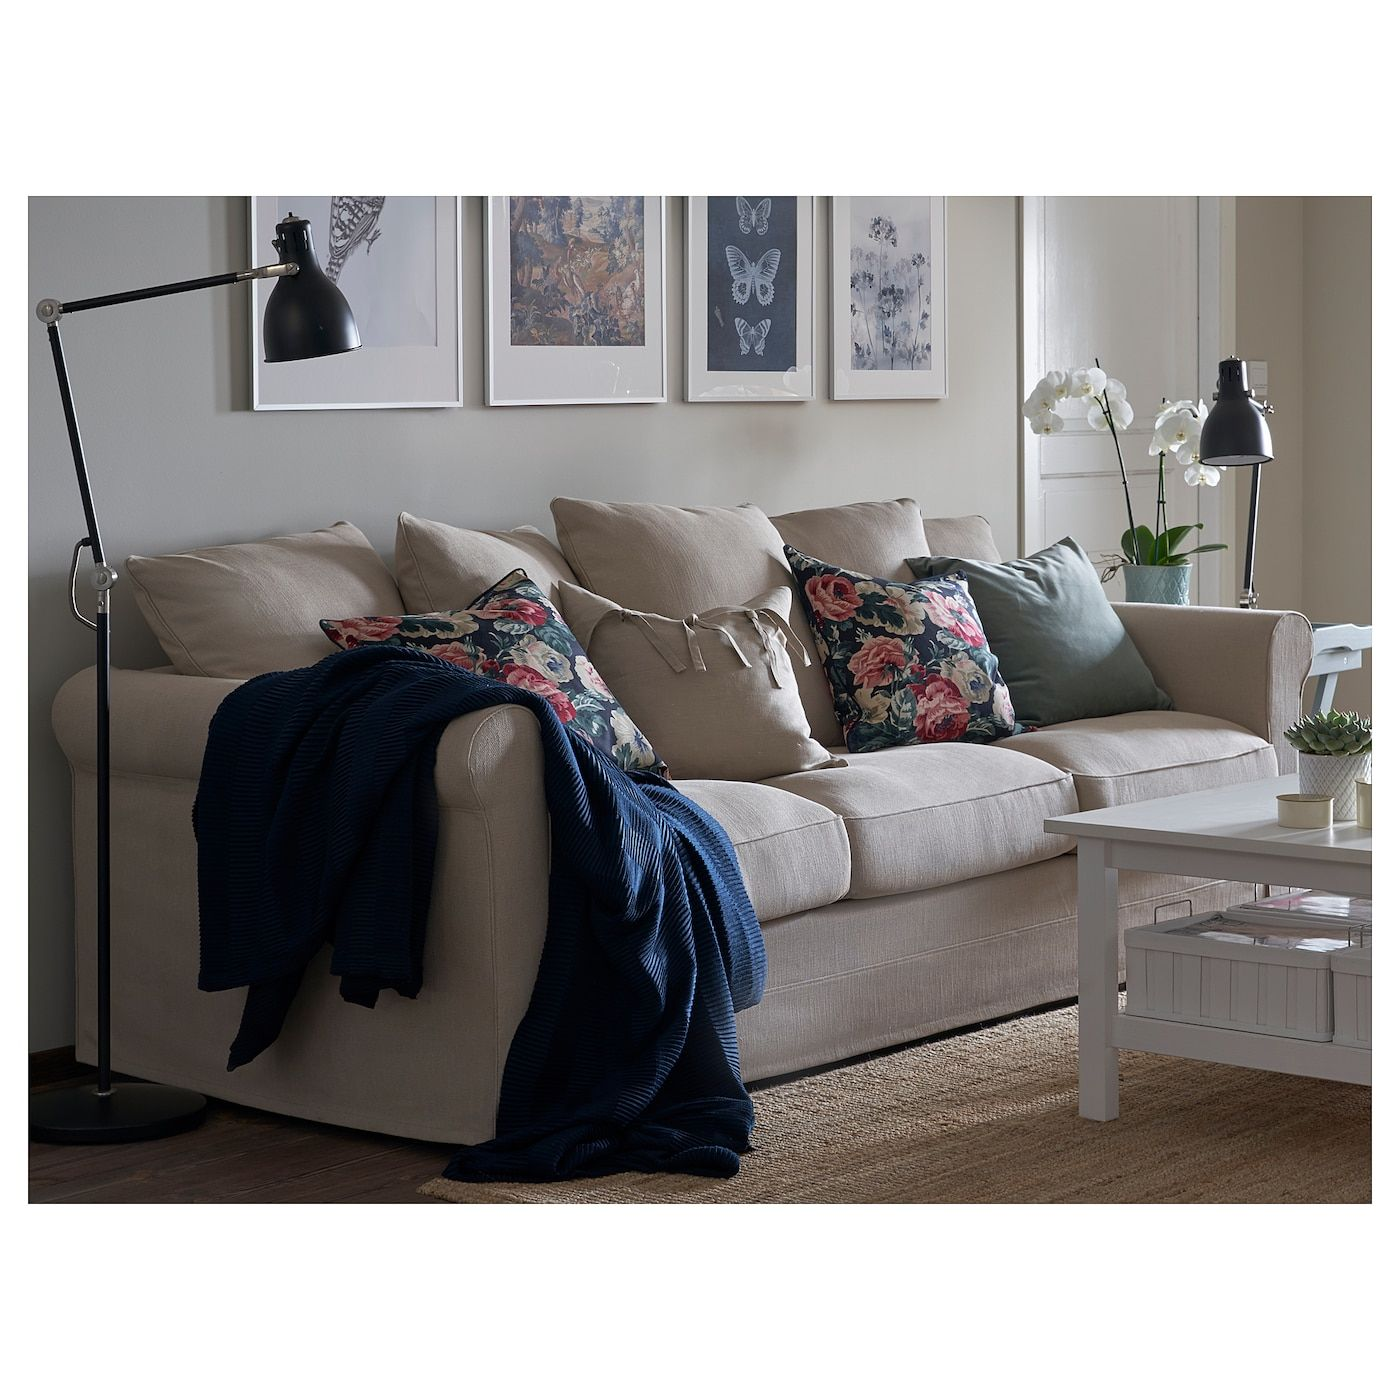 Ikea Gronlid Sporda Natural Sofa In